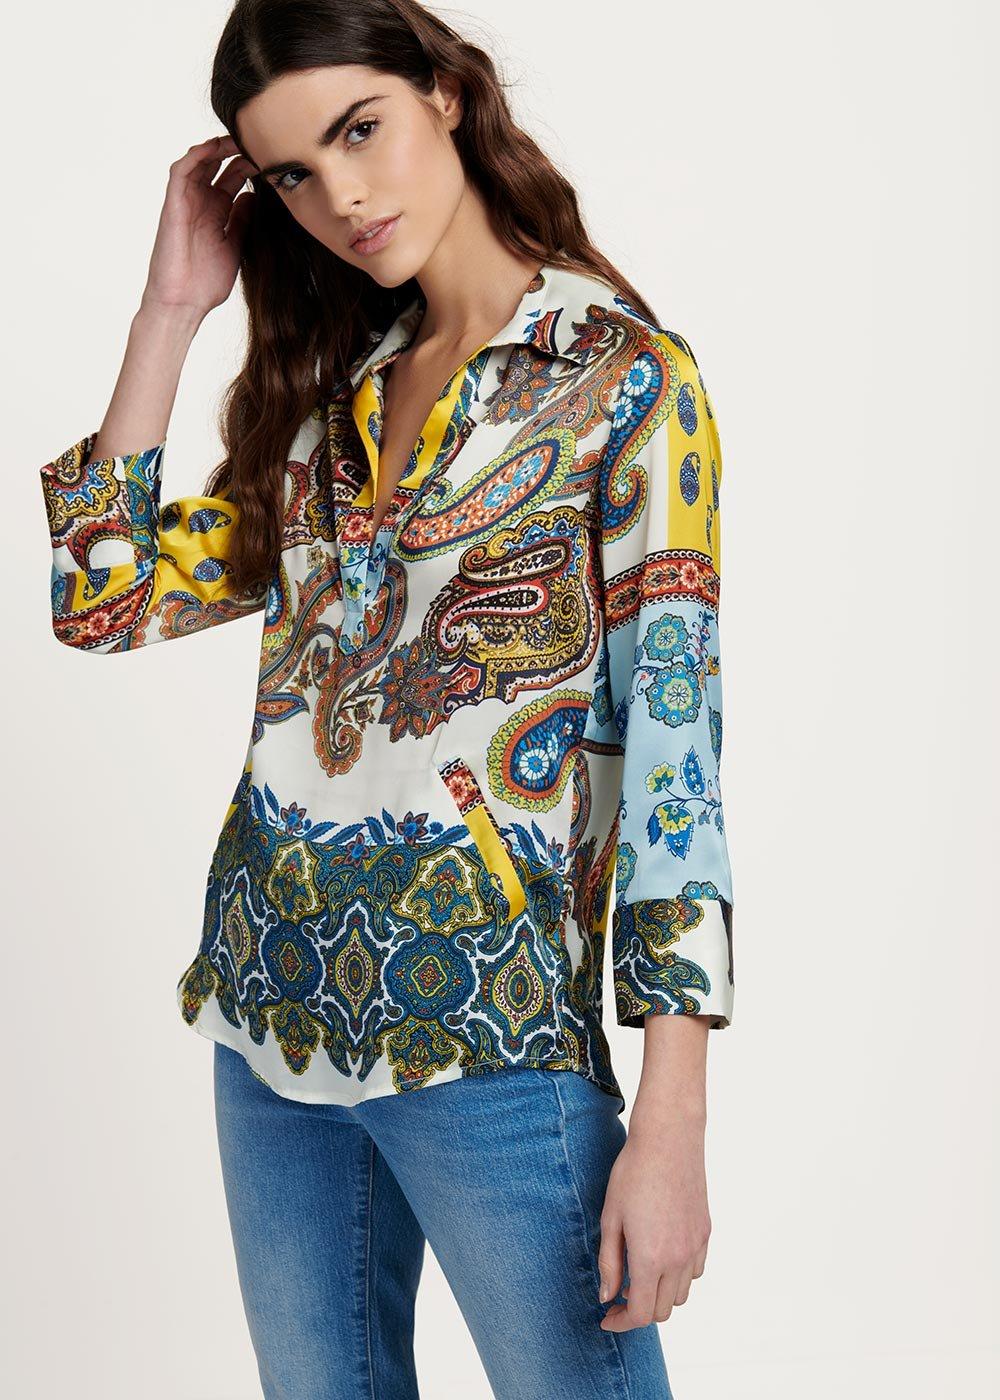 Blusa modello Angela fantasia cachemire colorata - White / Nettuno Fantasia - Donna